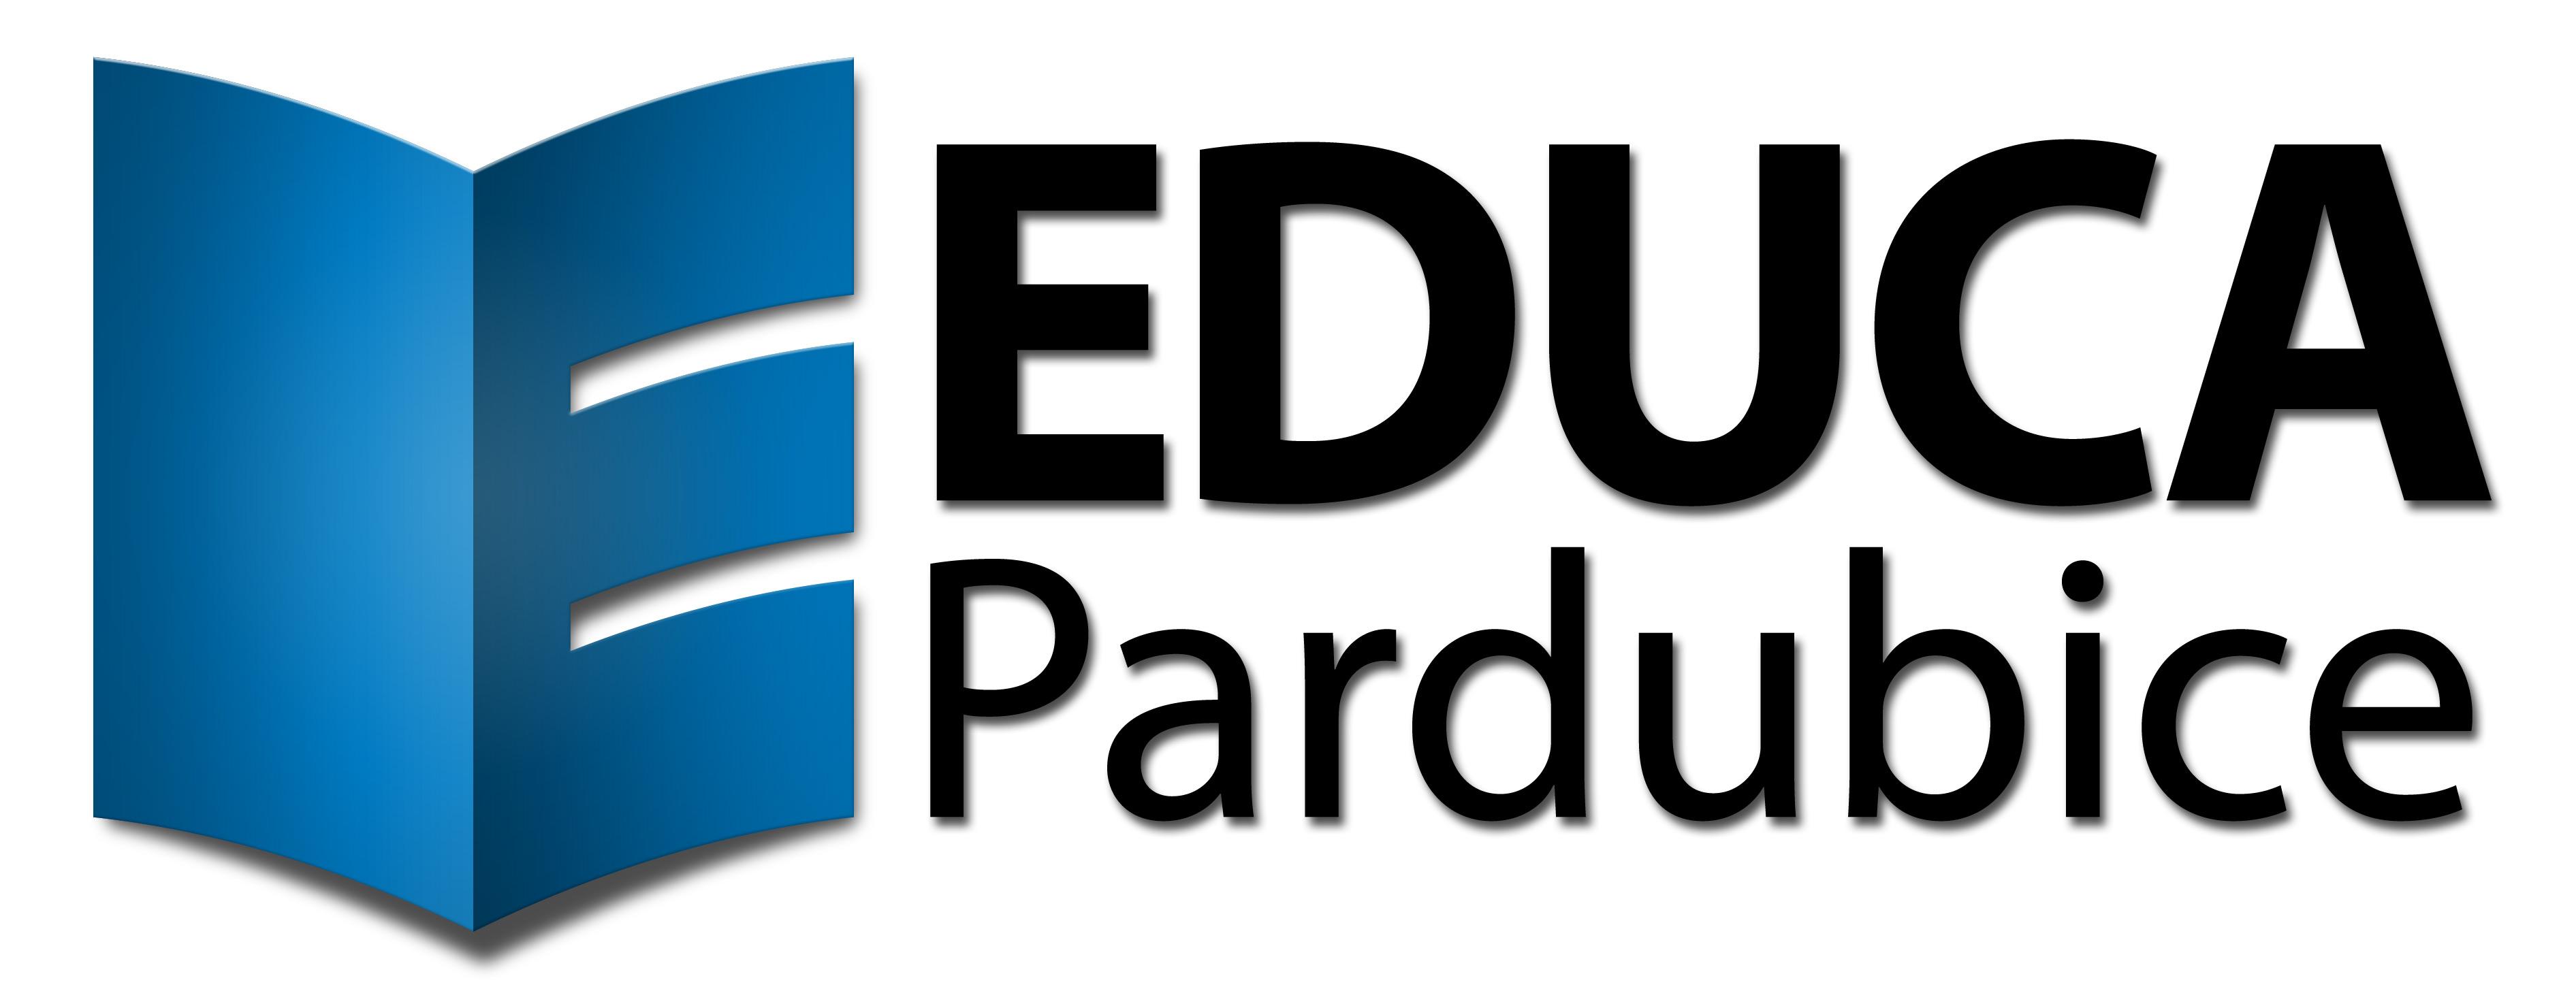 logo EDUCA Pardubice - Střední odborná škola, s.r.o.